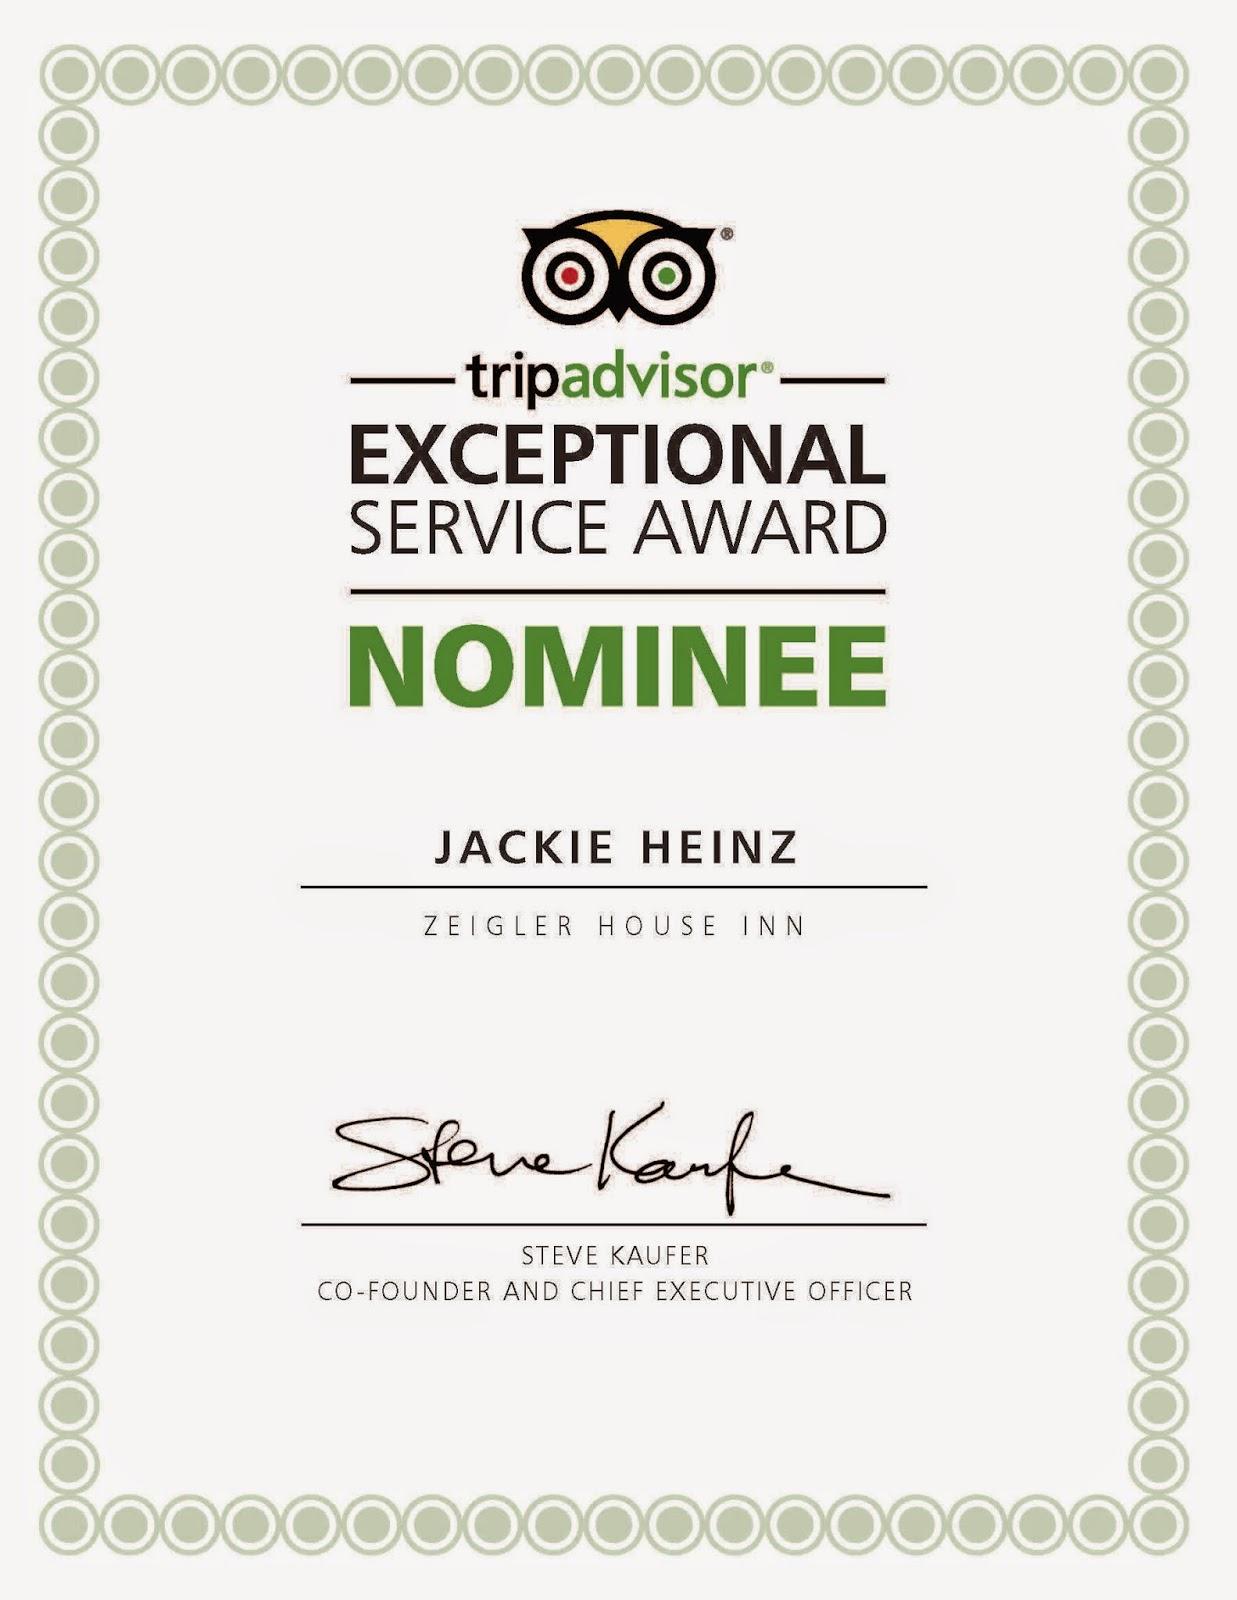 Savannah inn's innkeeper is TripAdvisor Exceptional Award Nominee